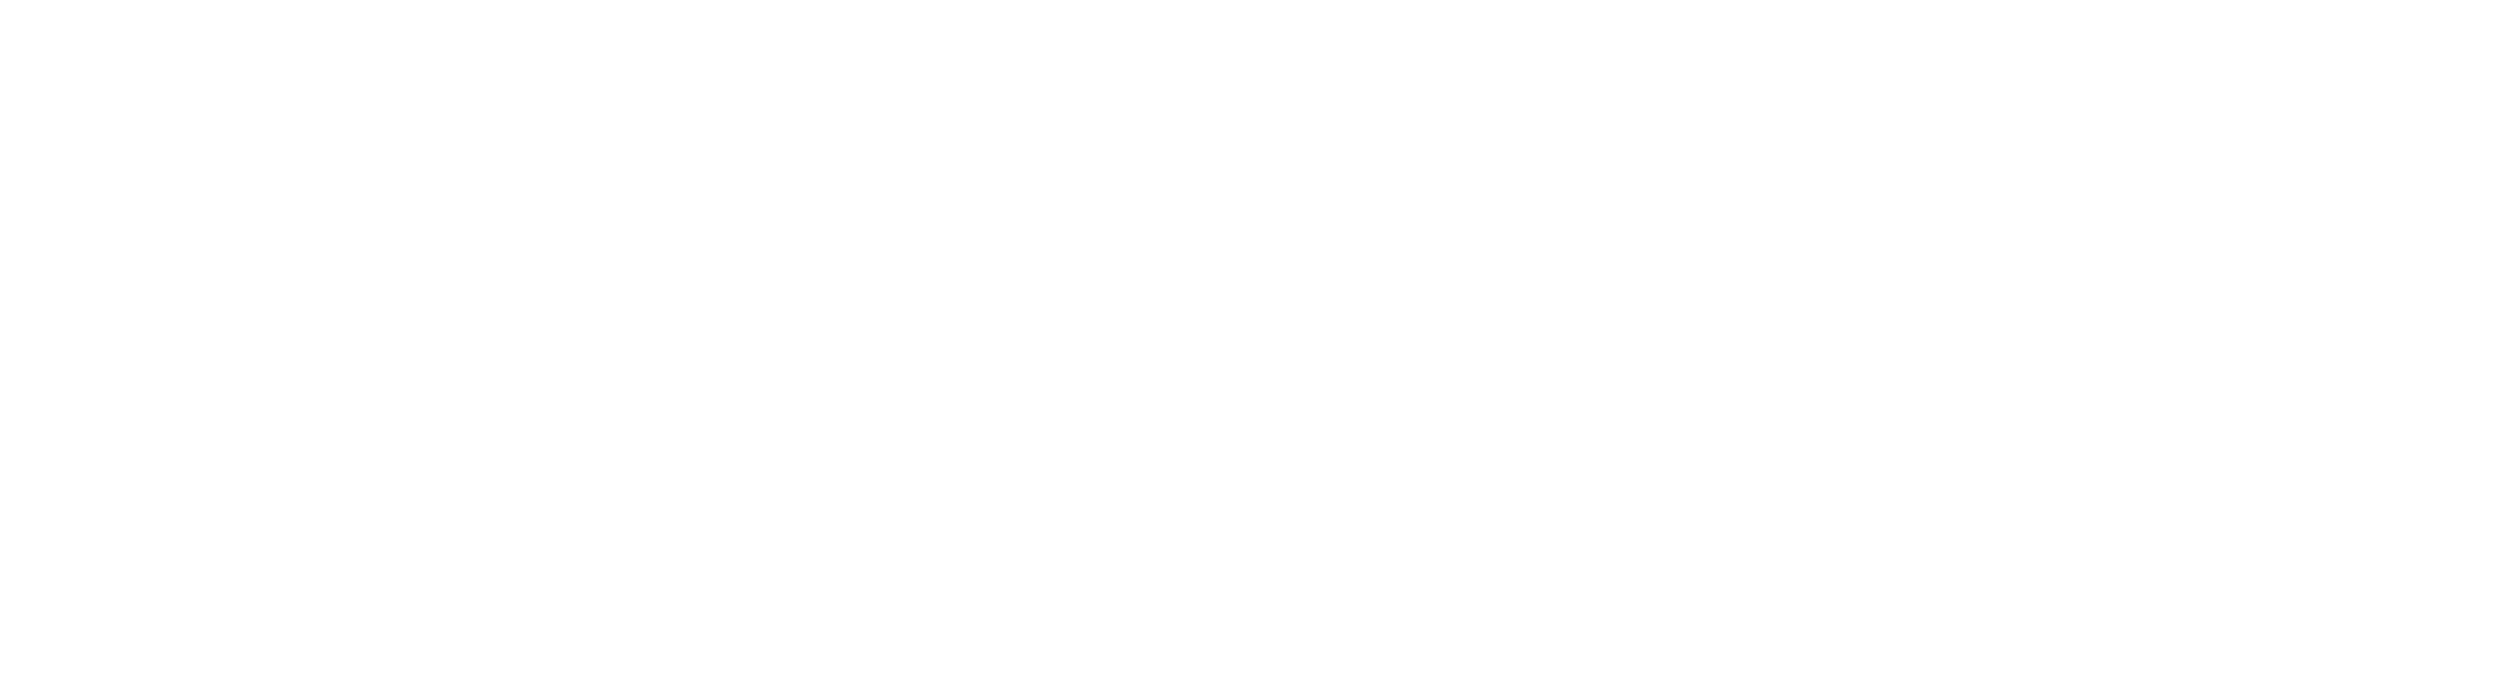 Soothe Aesthetics Skin Wellness & Lash Lounge